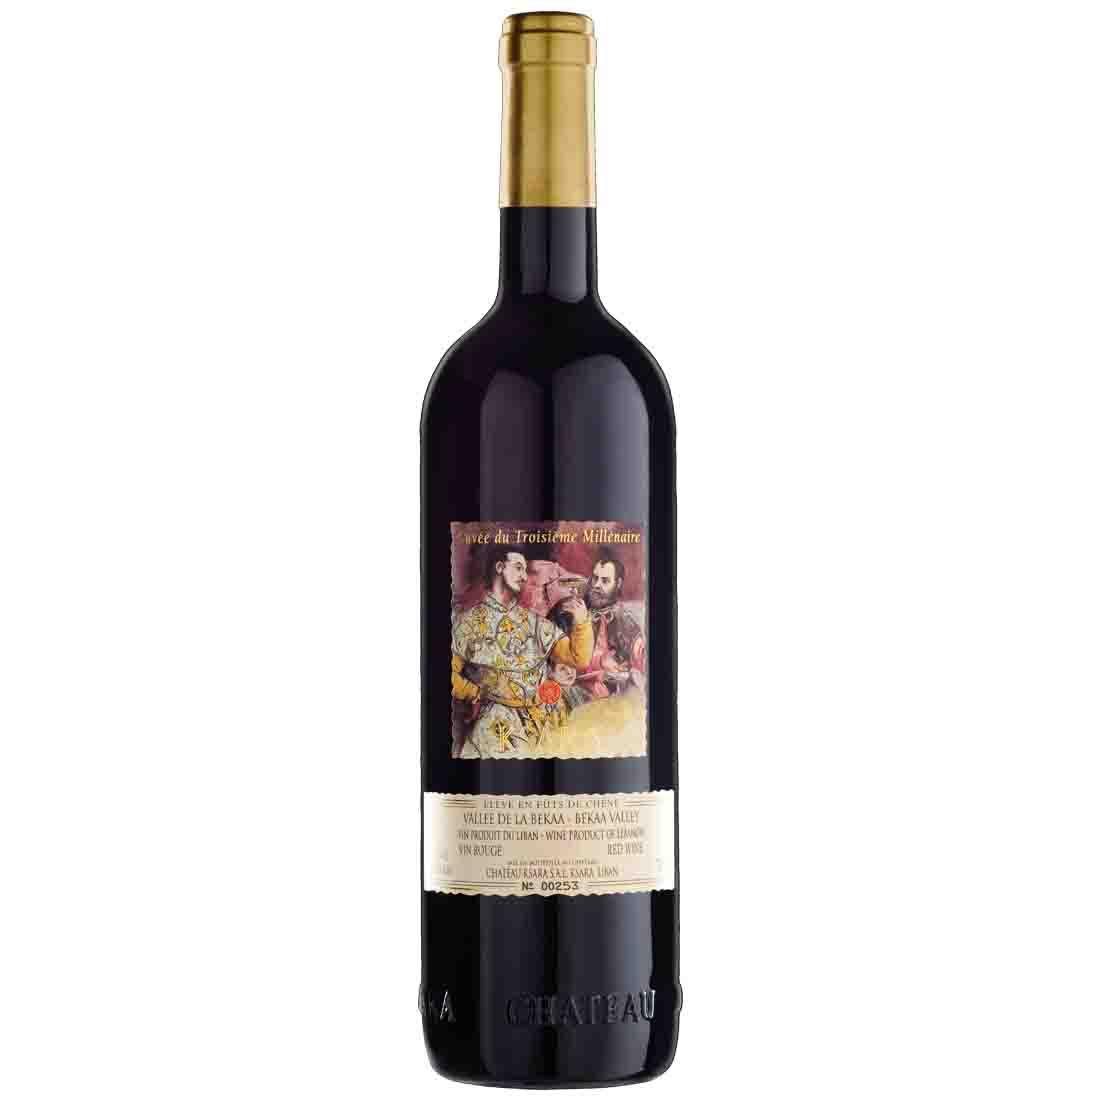 ksara Lebanese red wine Robert parker cuvee du millenaire petit verdot cabernet franc syrah bekaa